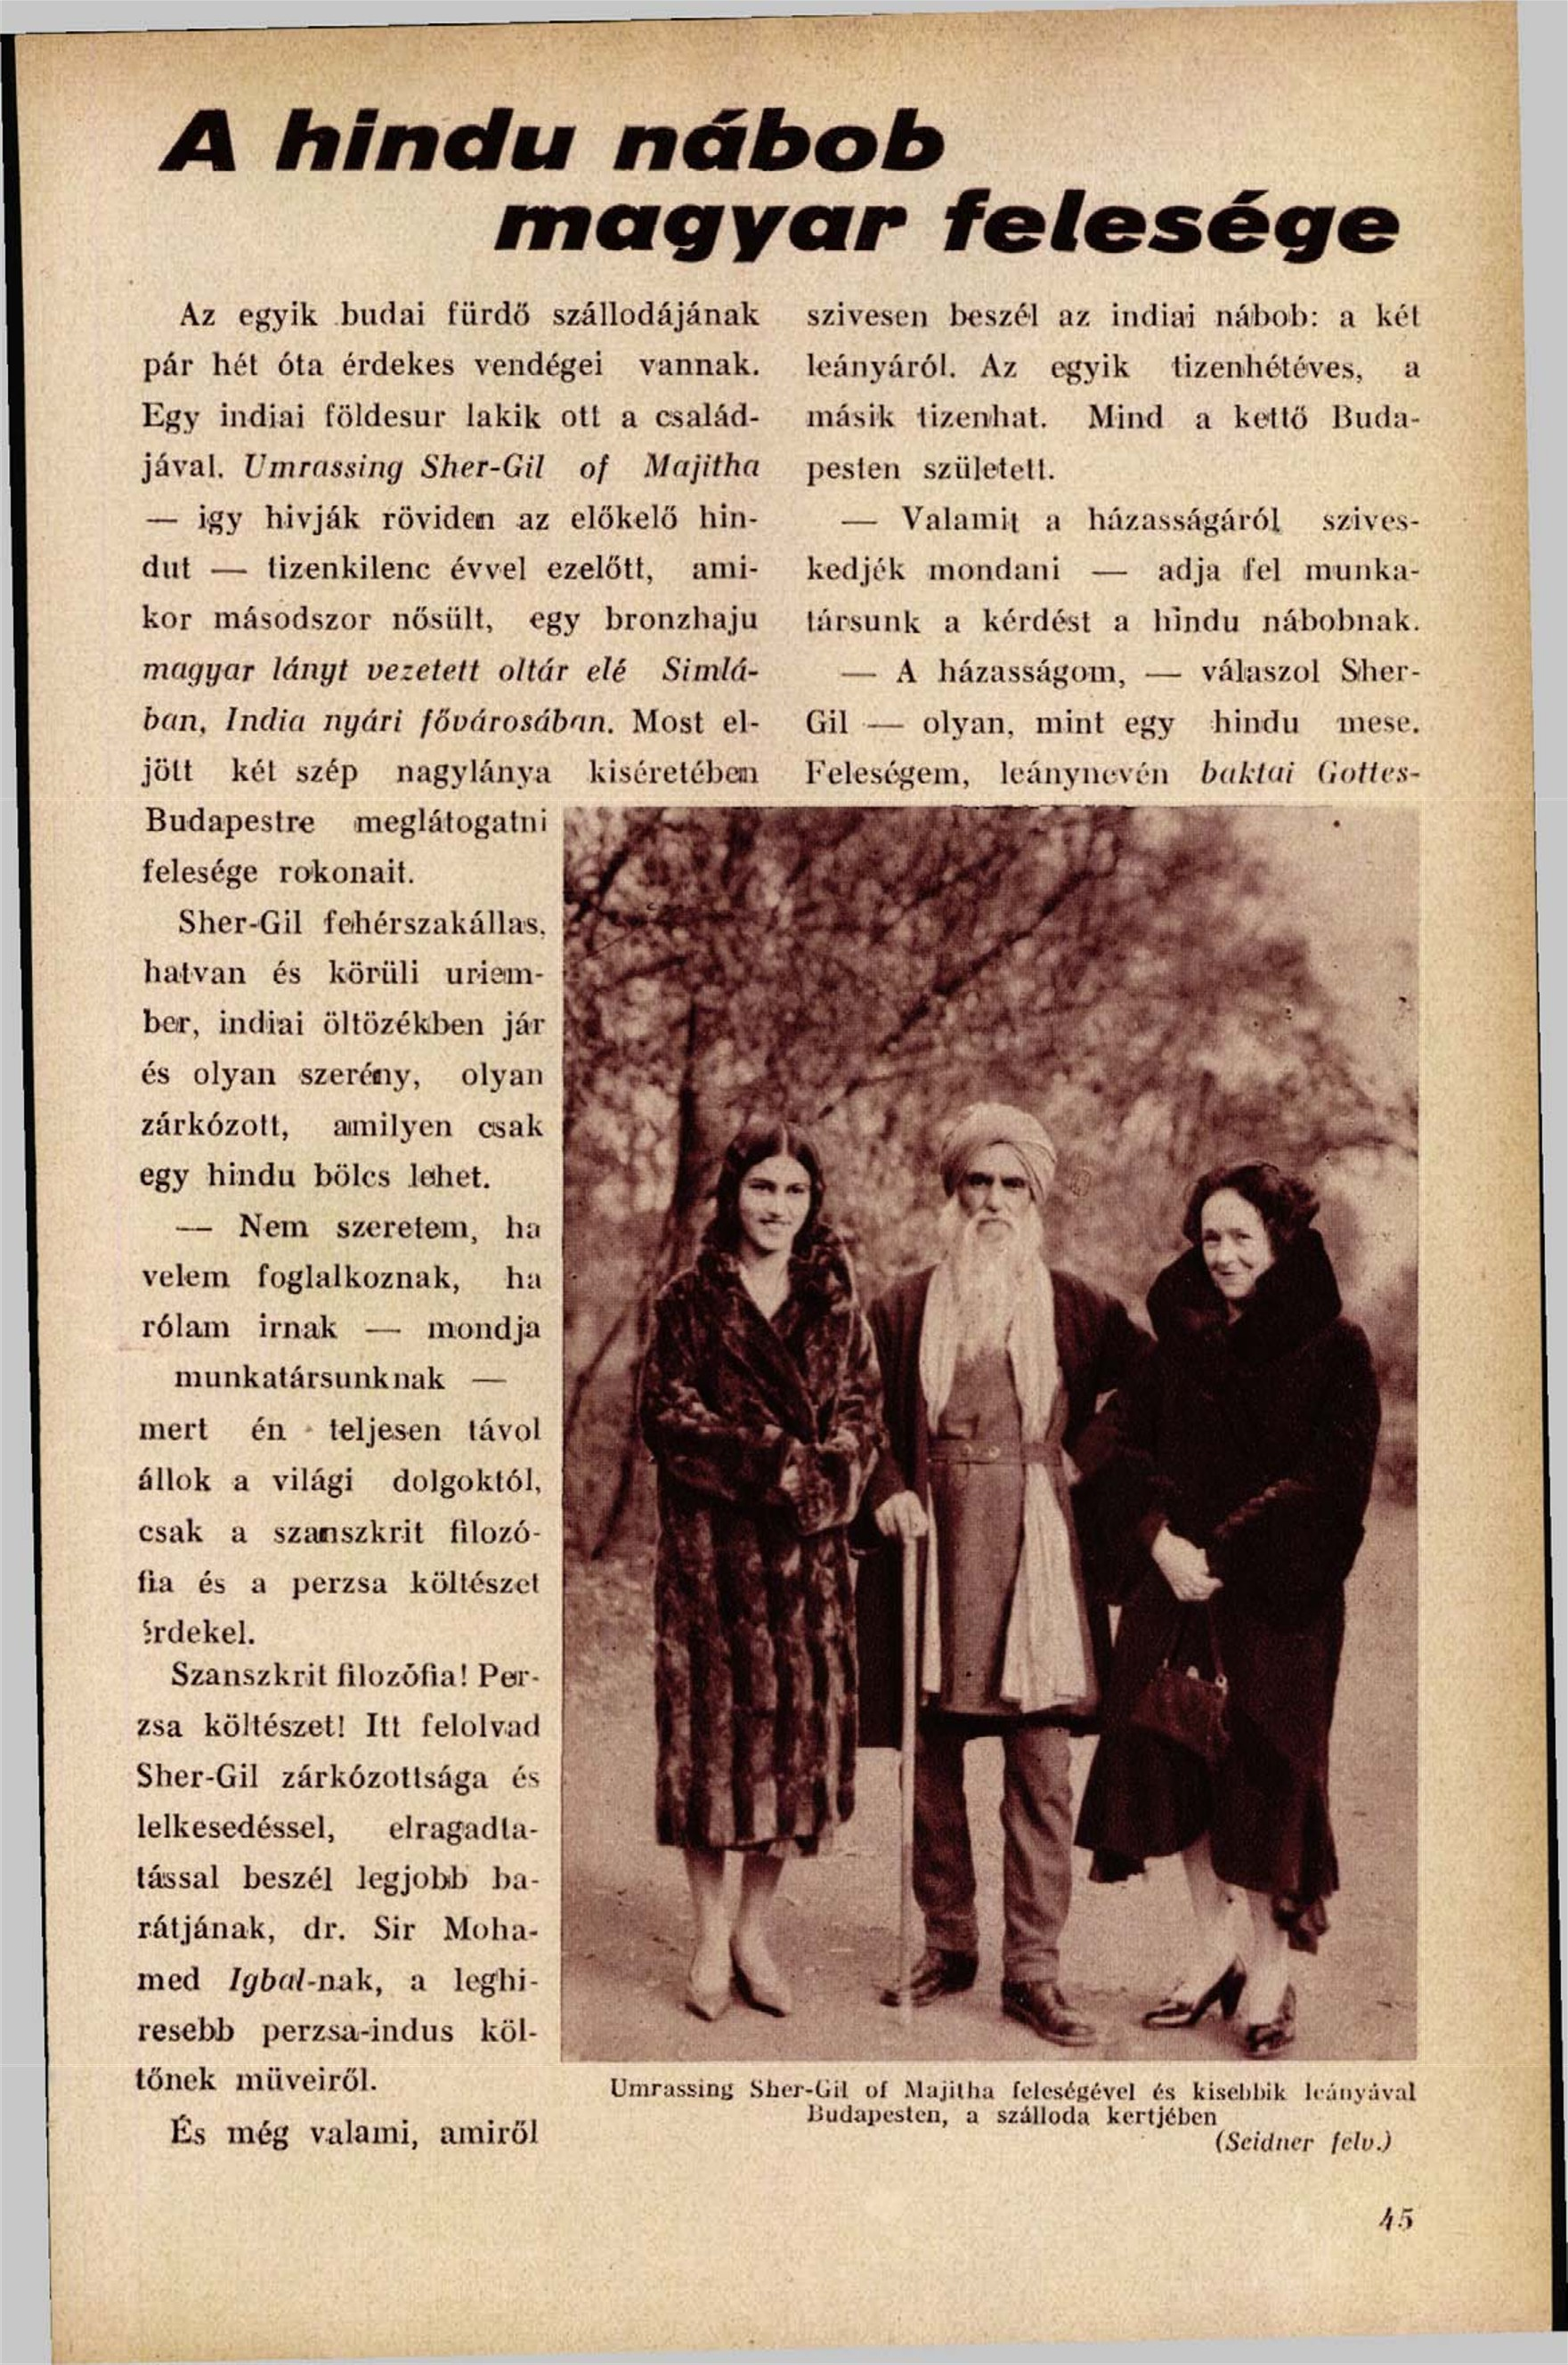 szinhazielet_1930_46_pages47-47.jpg